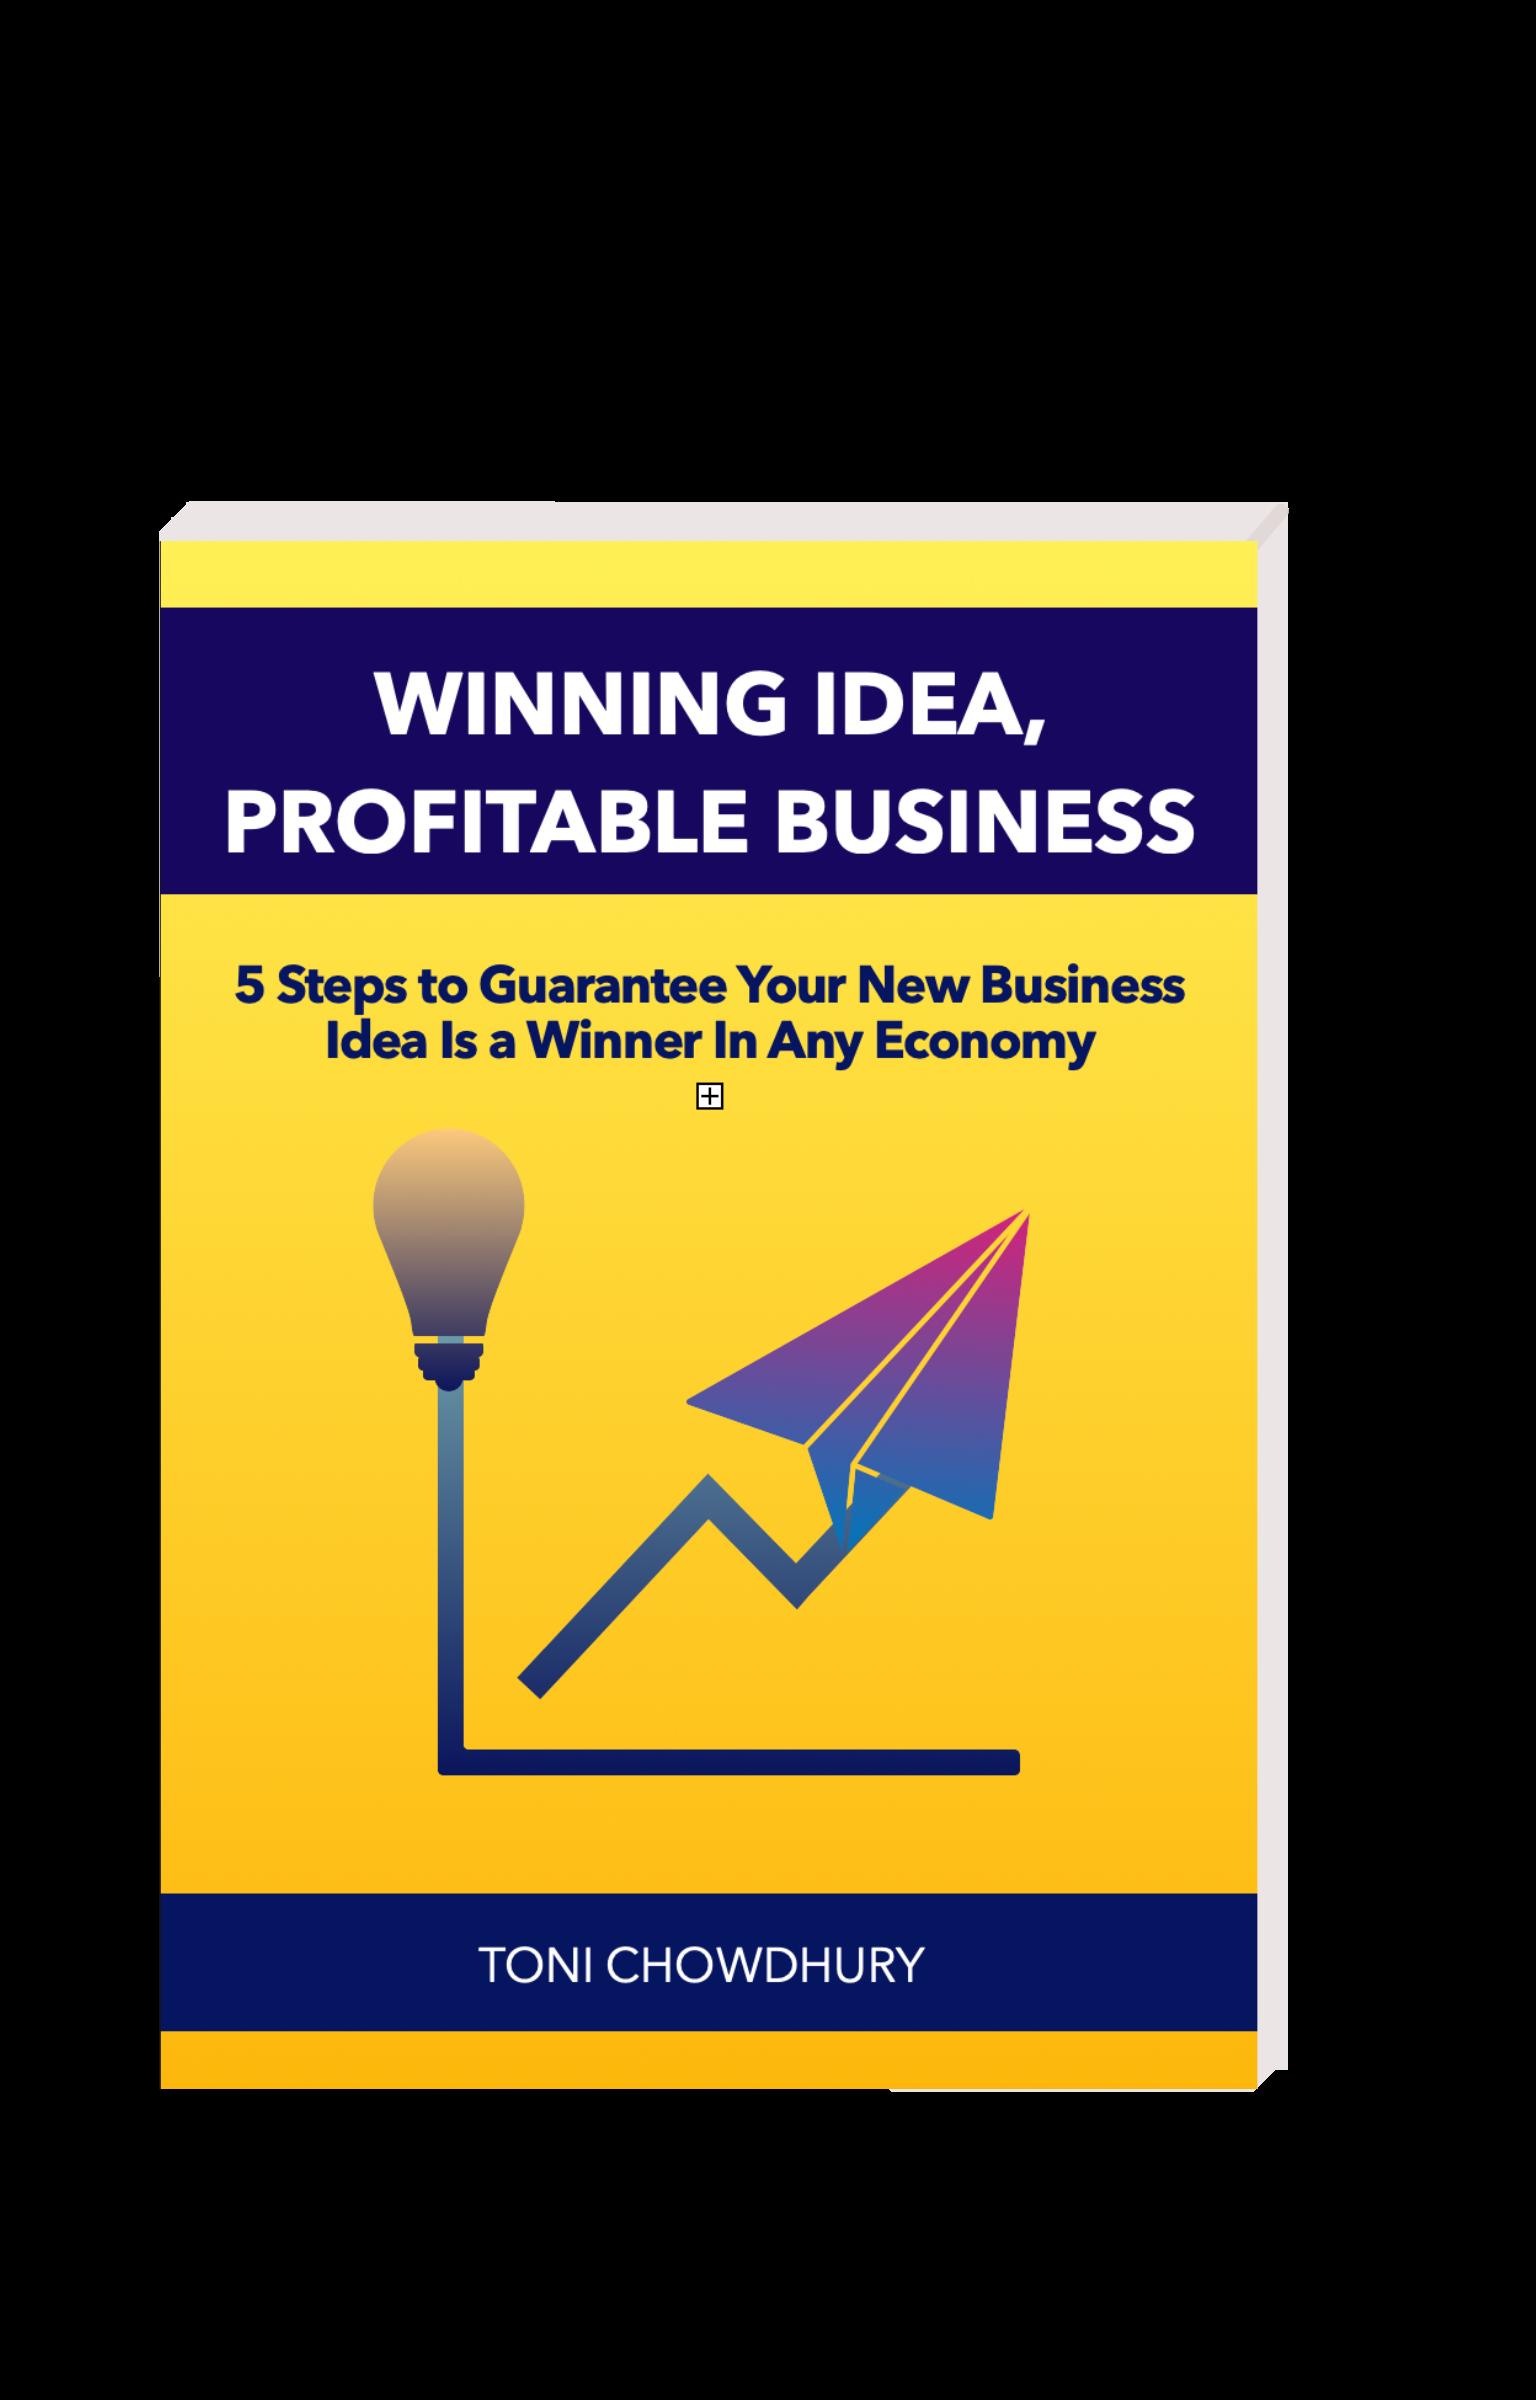 Ebook by Toni Chowdhury - Winning Idea, Profitable Business